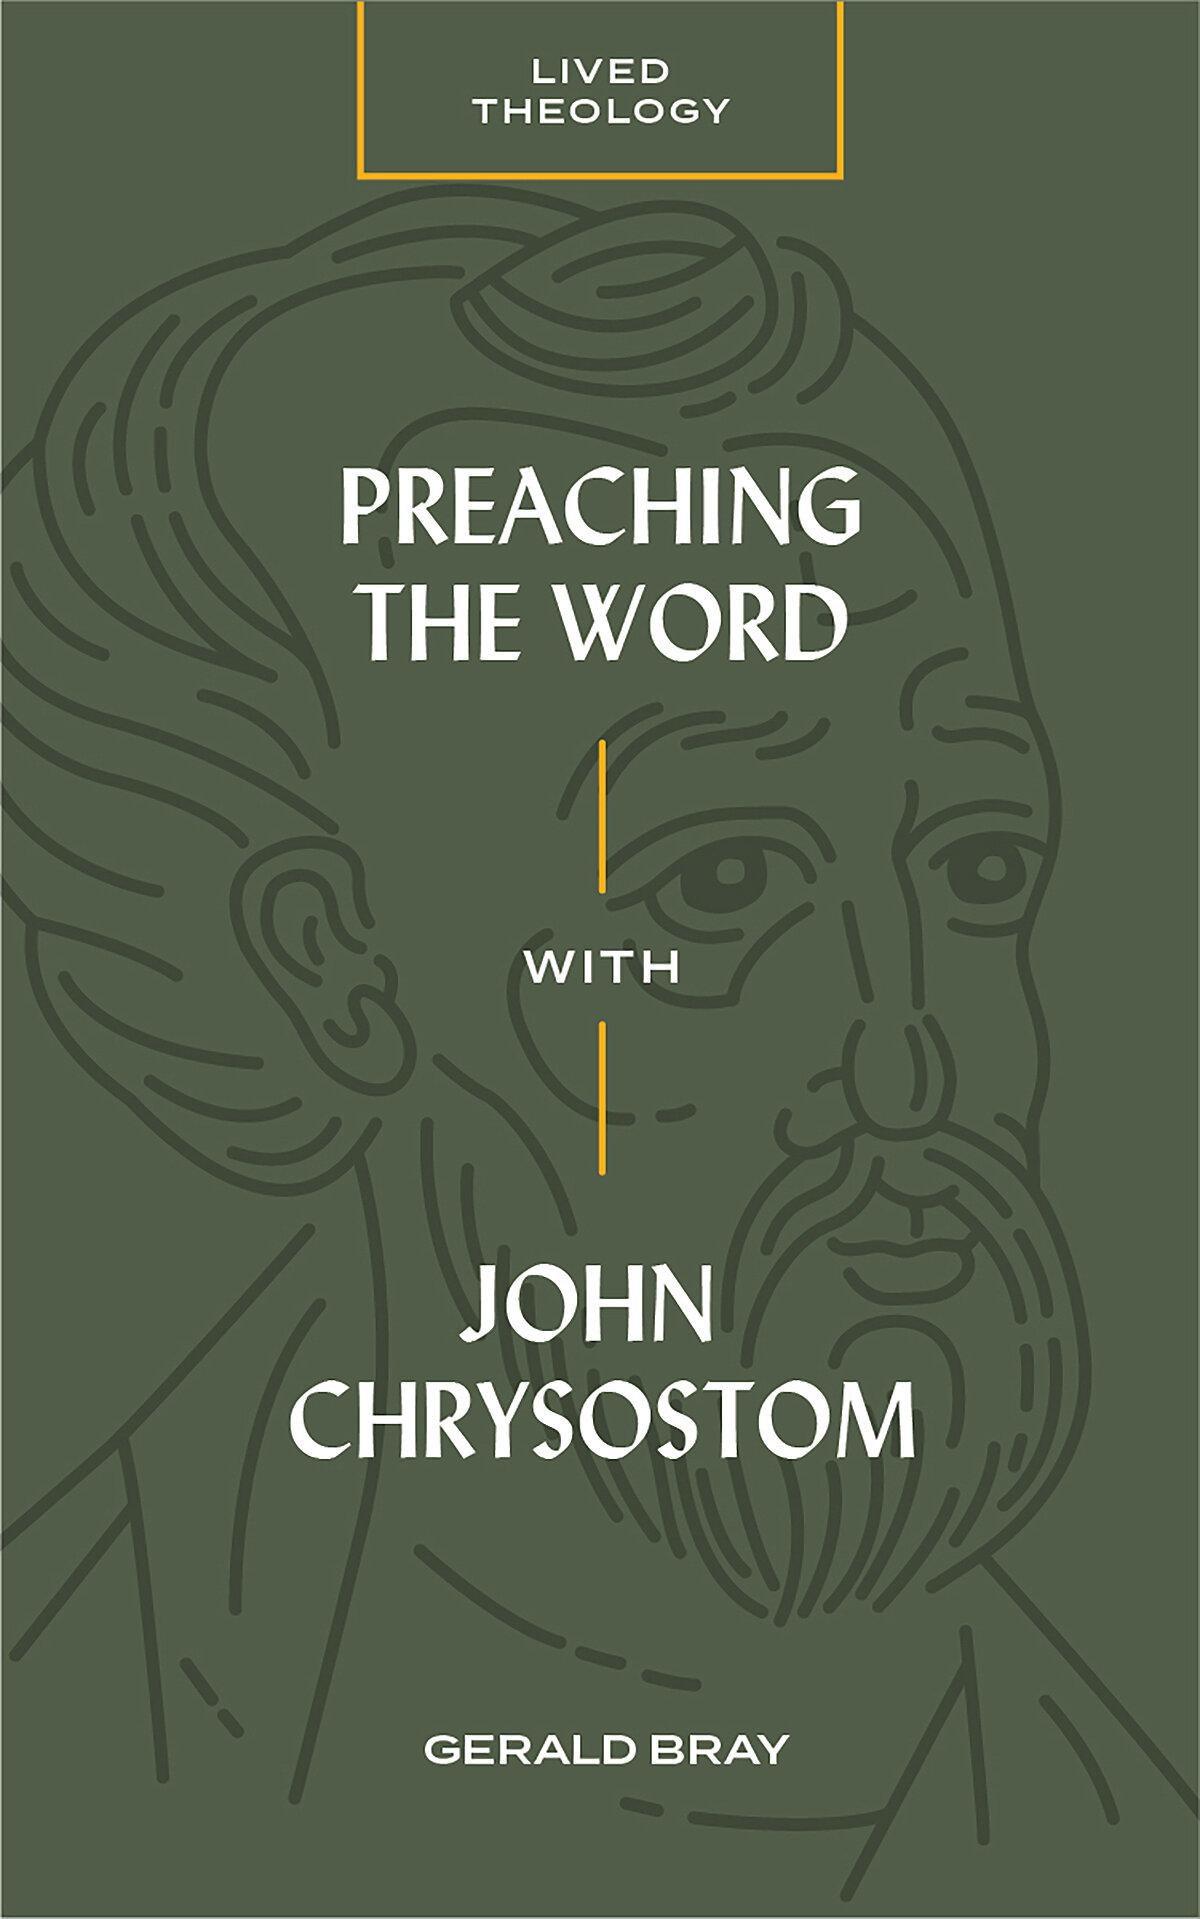 Preaching the Word with John Chrysostom